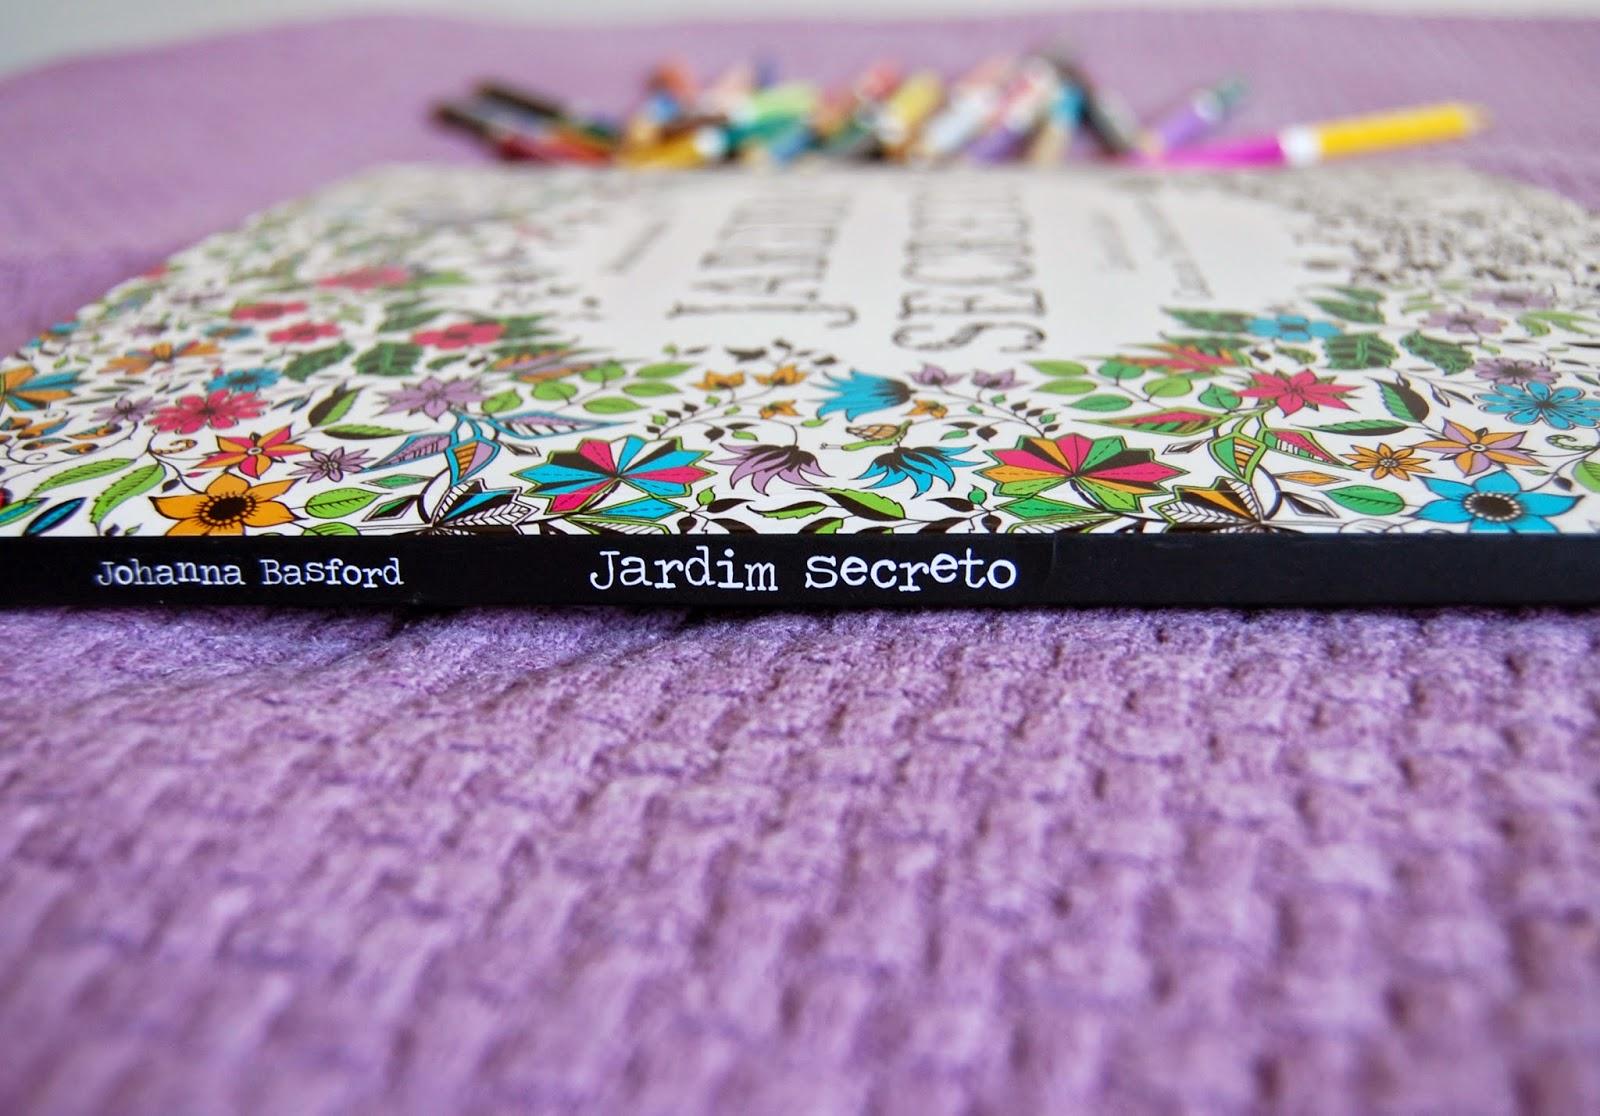 livro Jardim Secreto de Johanna Basford